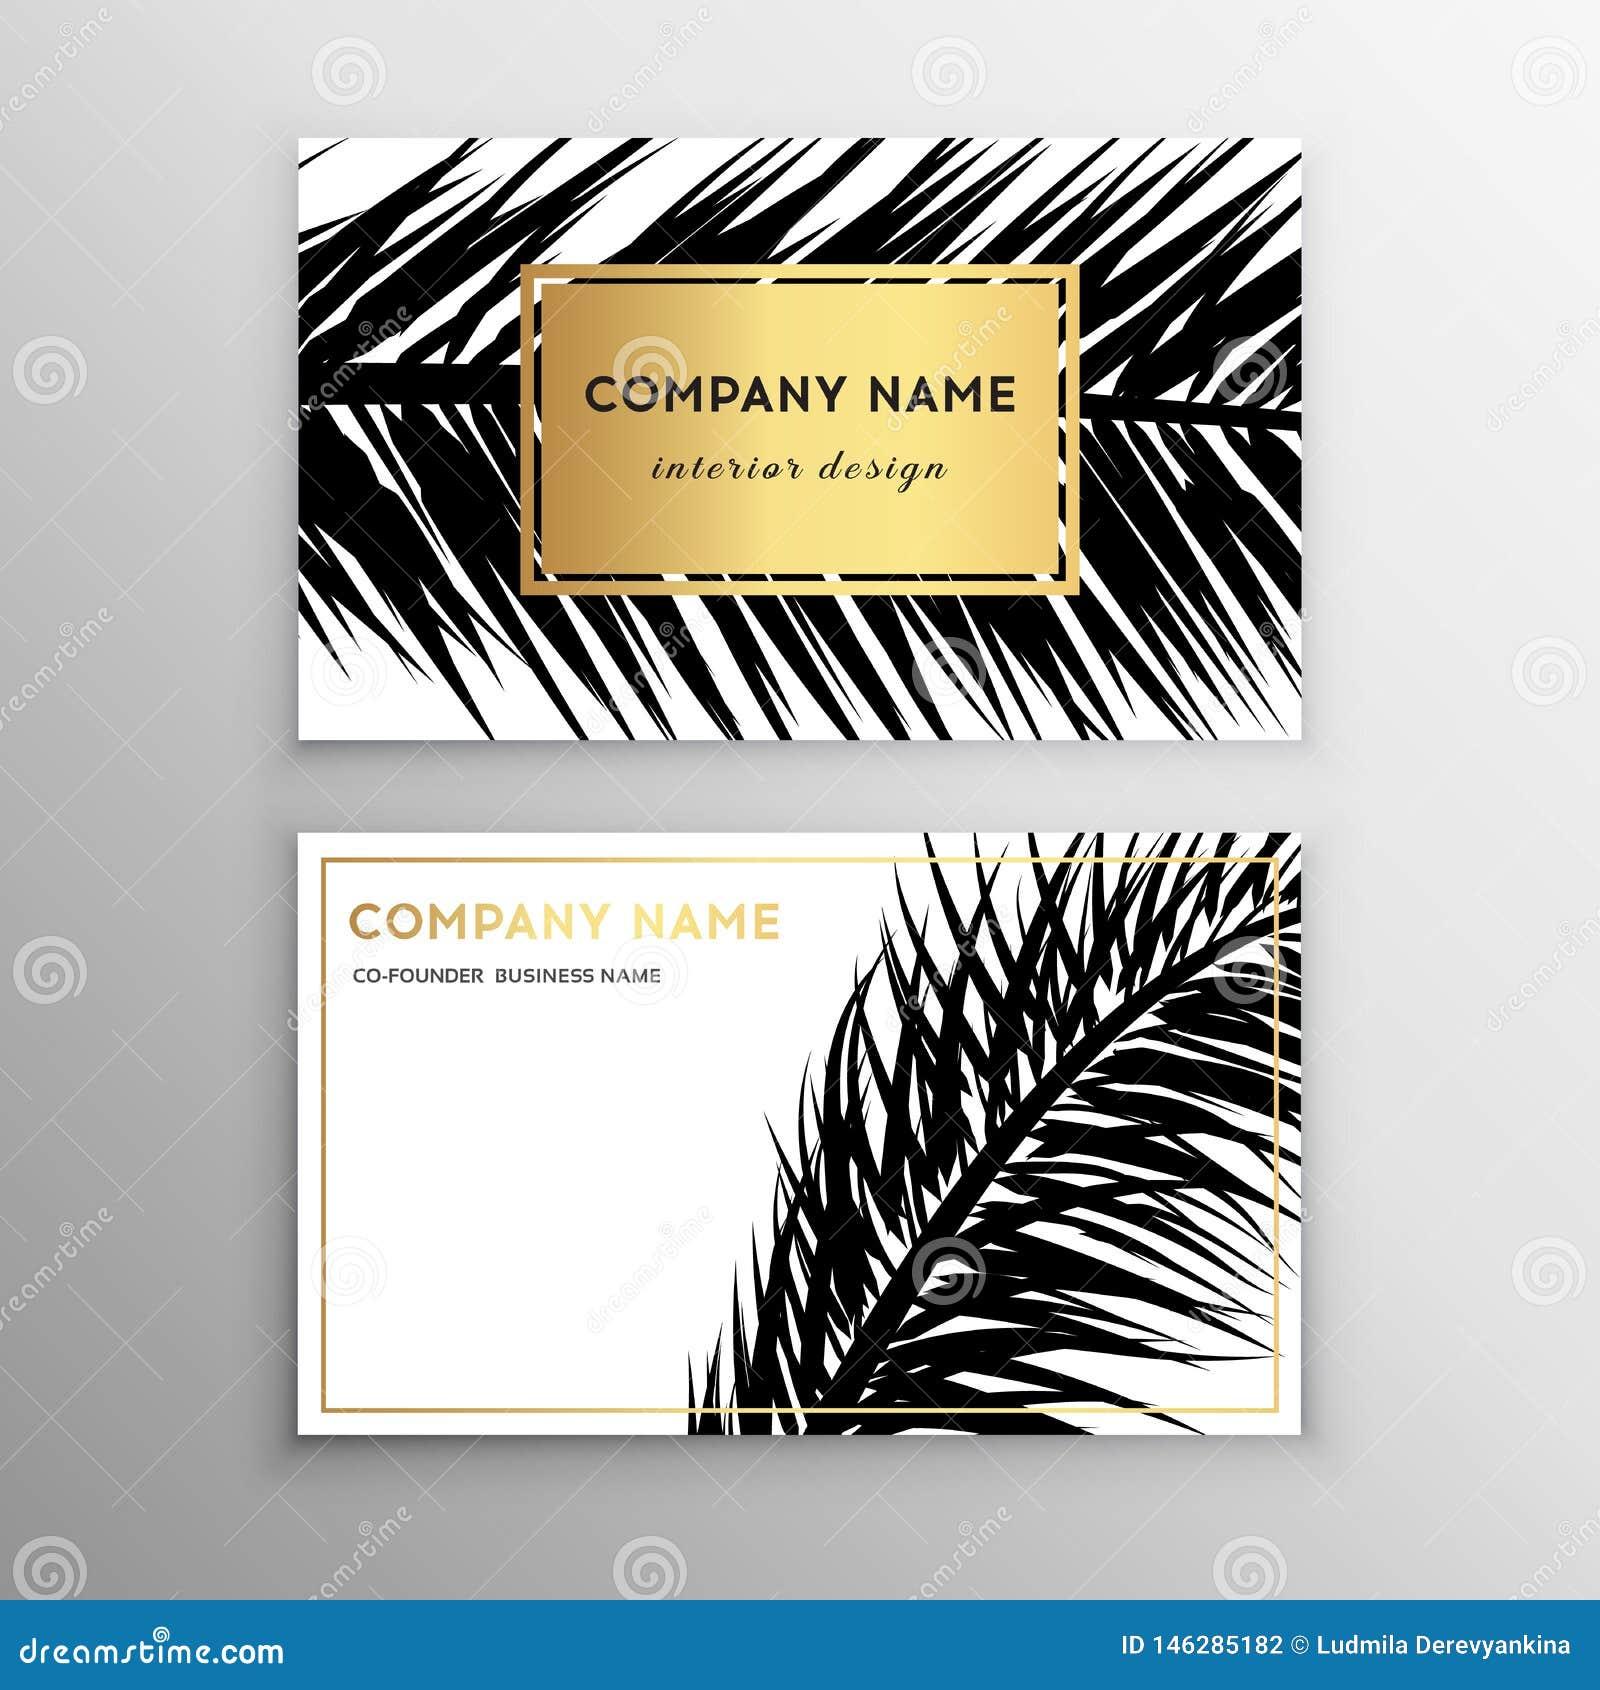 business cards tropical graphic design tropical palm leaf. Black Bedroom Furniture Sets. Home Design Ideas